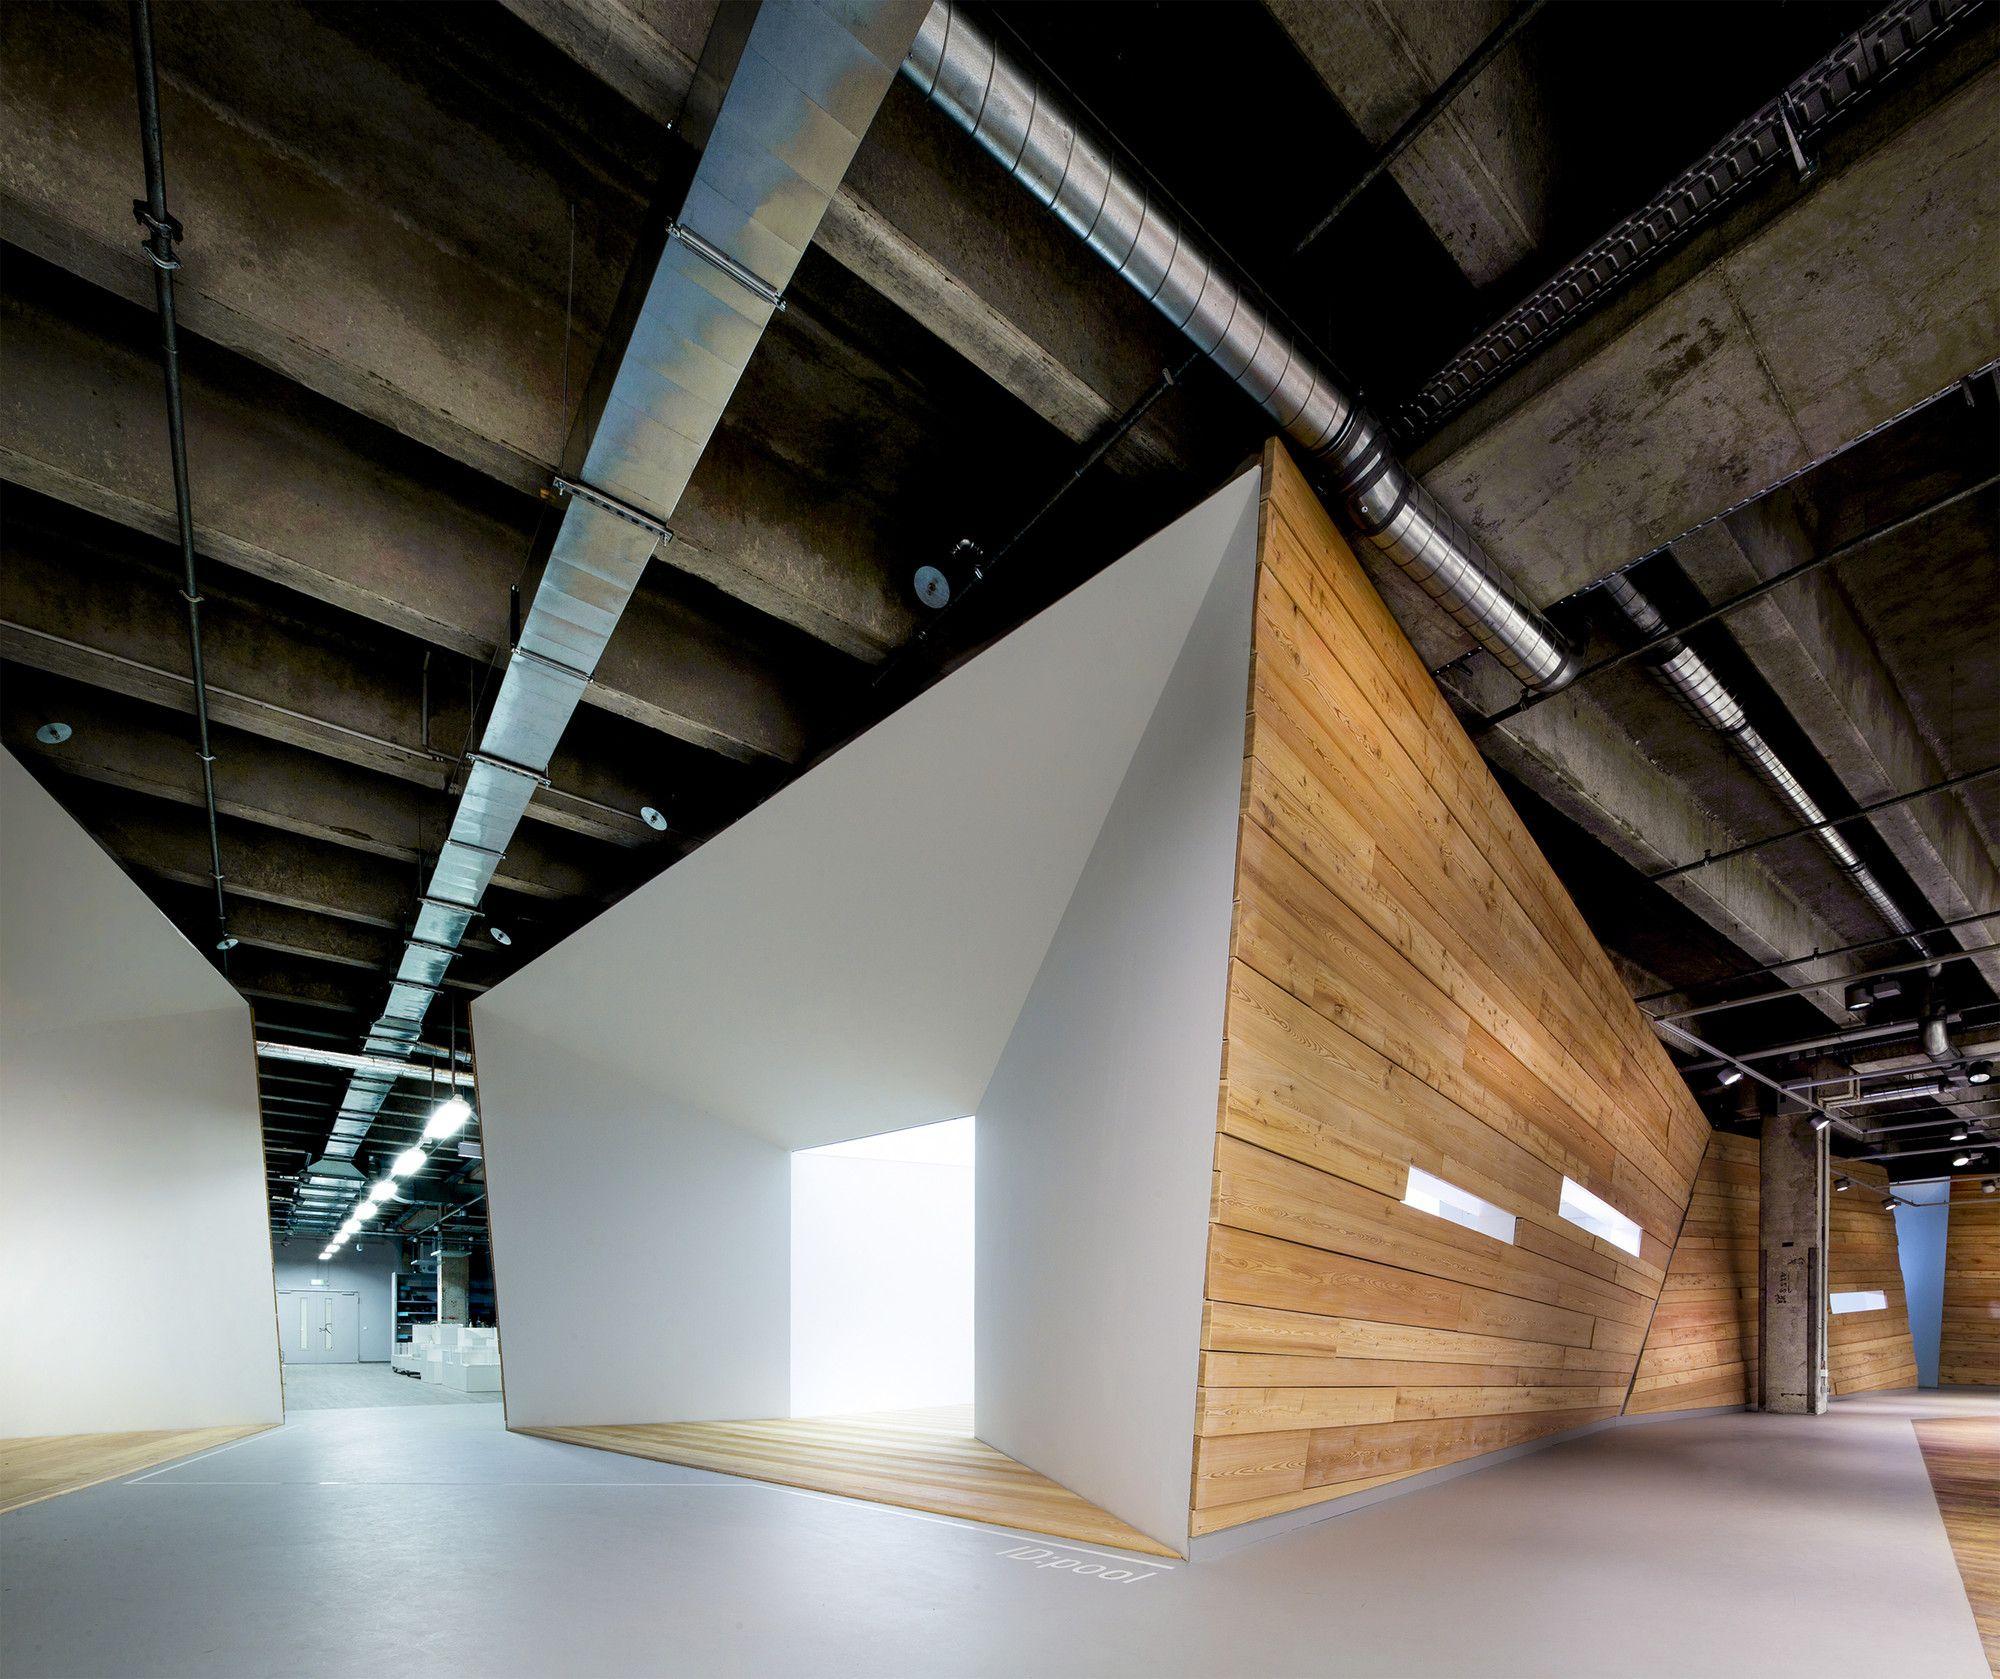 Innenarchitektur Chur gallery of kreativlabs schöne räume architektur innenarchitektur